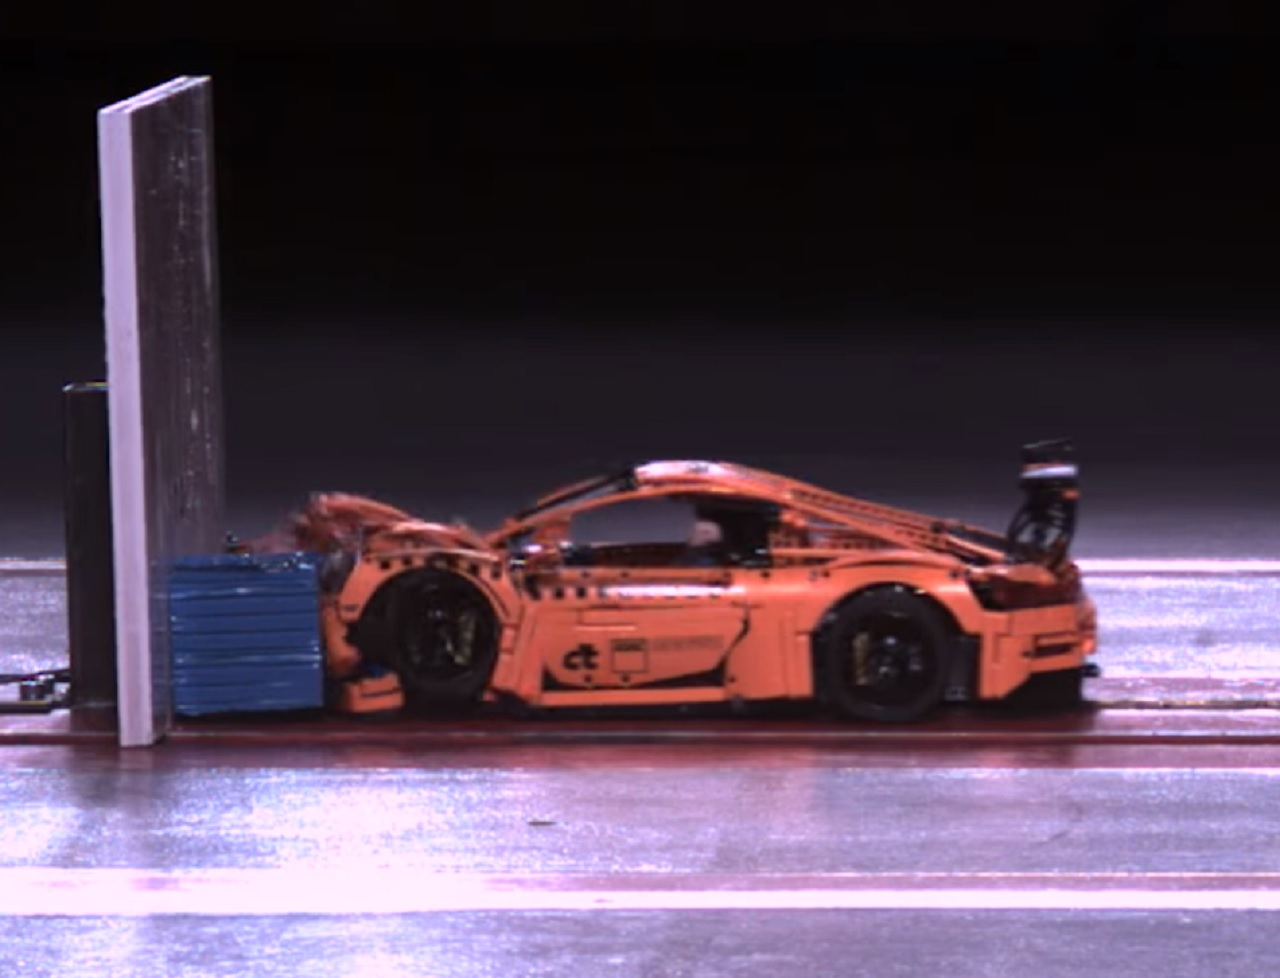 porsche-911-gt3-rs-lego-crash-test